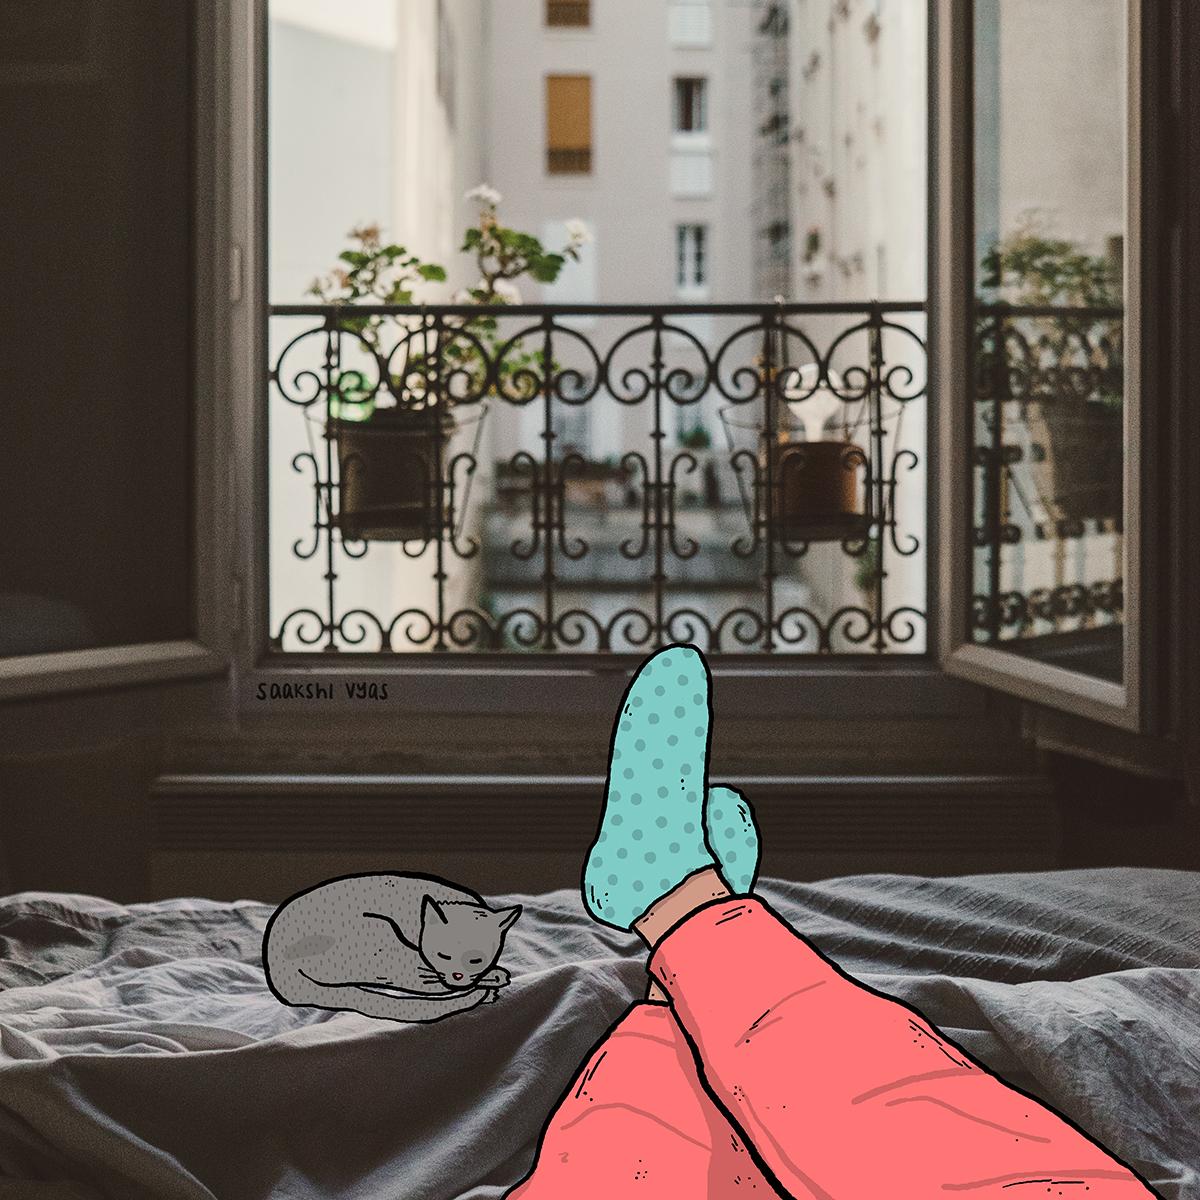 unsplash-Sunday-sleepin